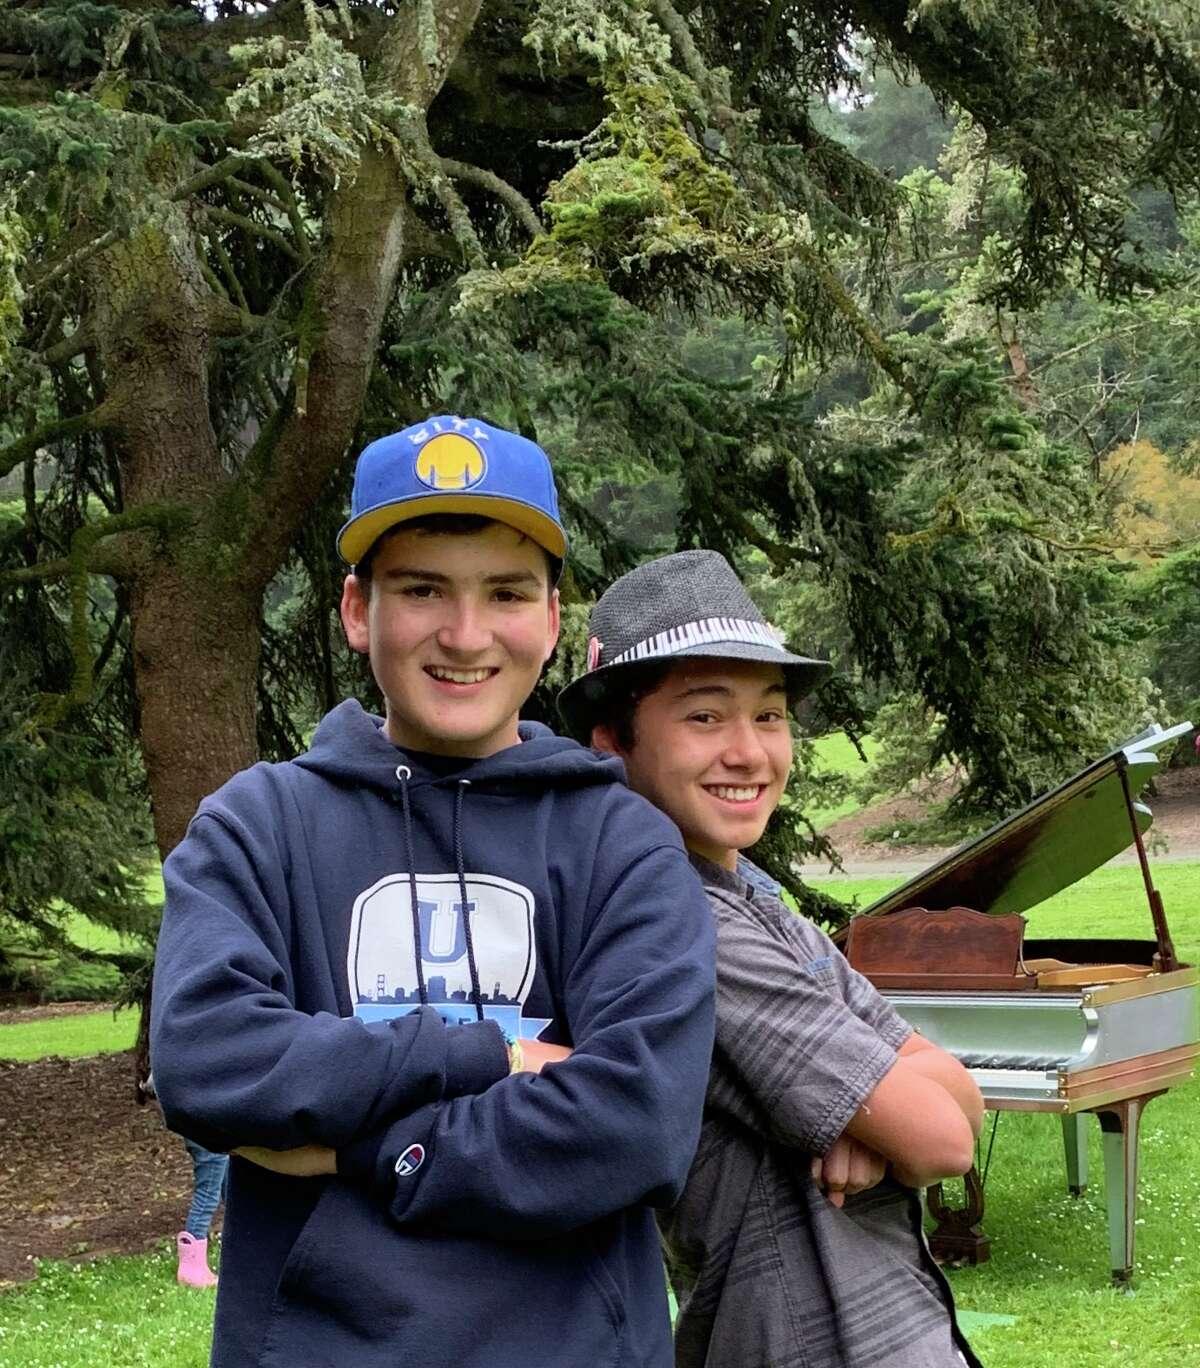 Oscar Cervarich, left, and Gavin Bermudez pose for a photo together near the pianos at the San Francisco Botanical Garden.